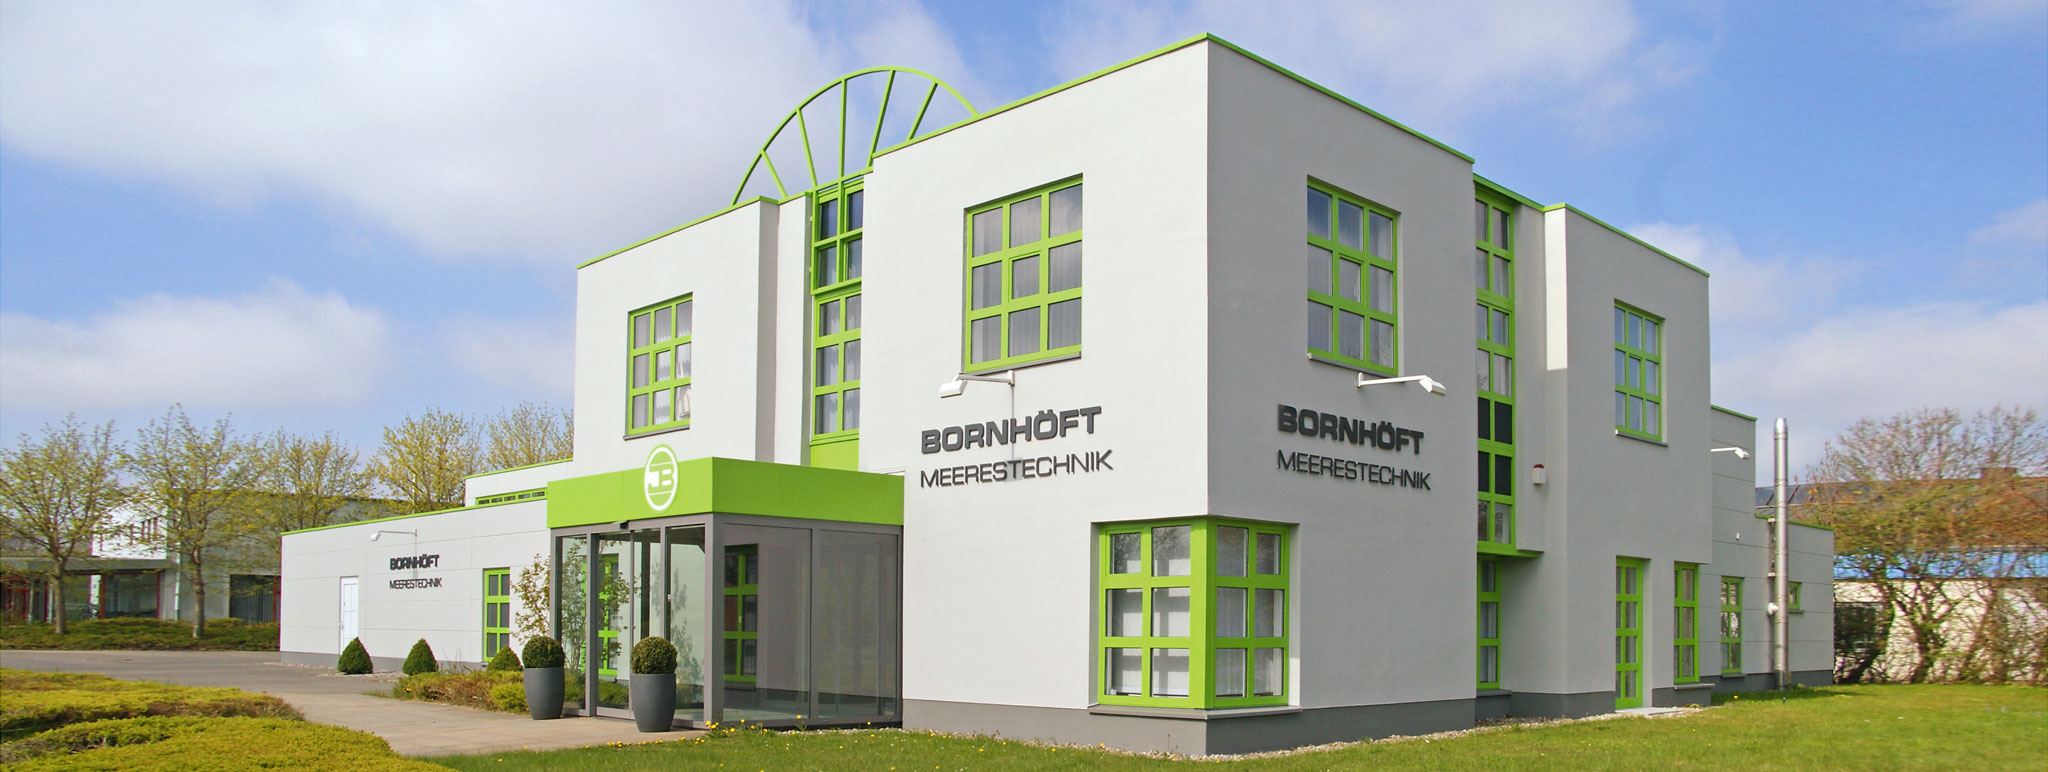 Bornhöft Heerestechnik - Firmengebäude in Kiel